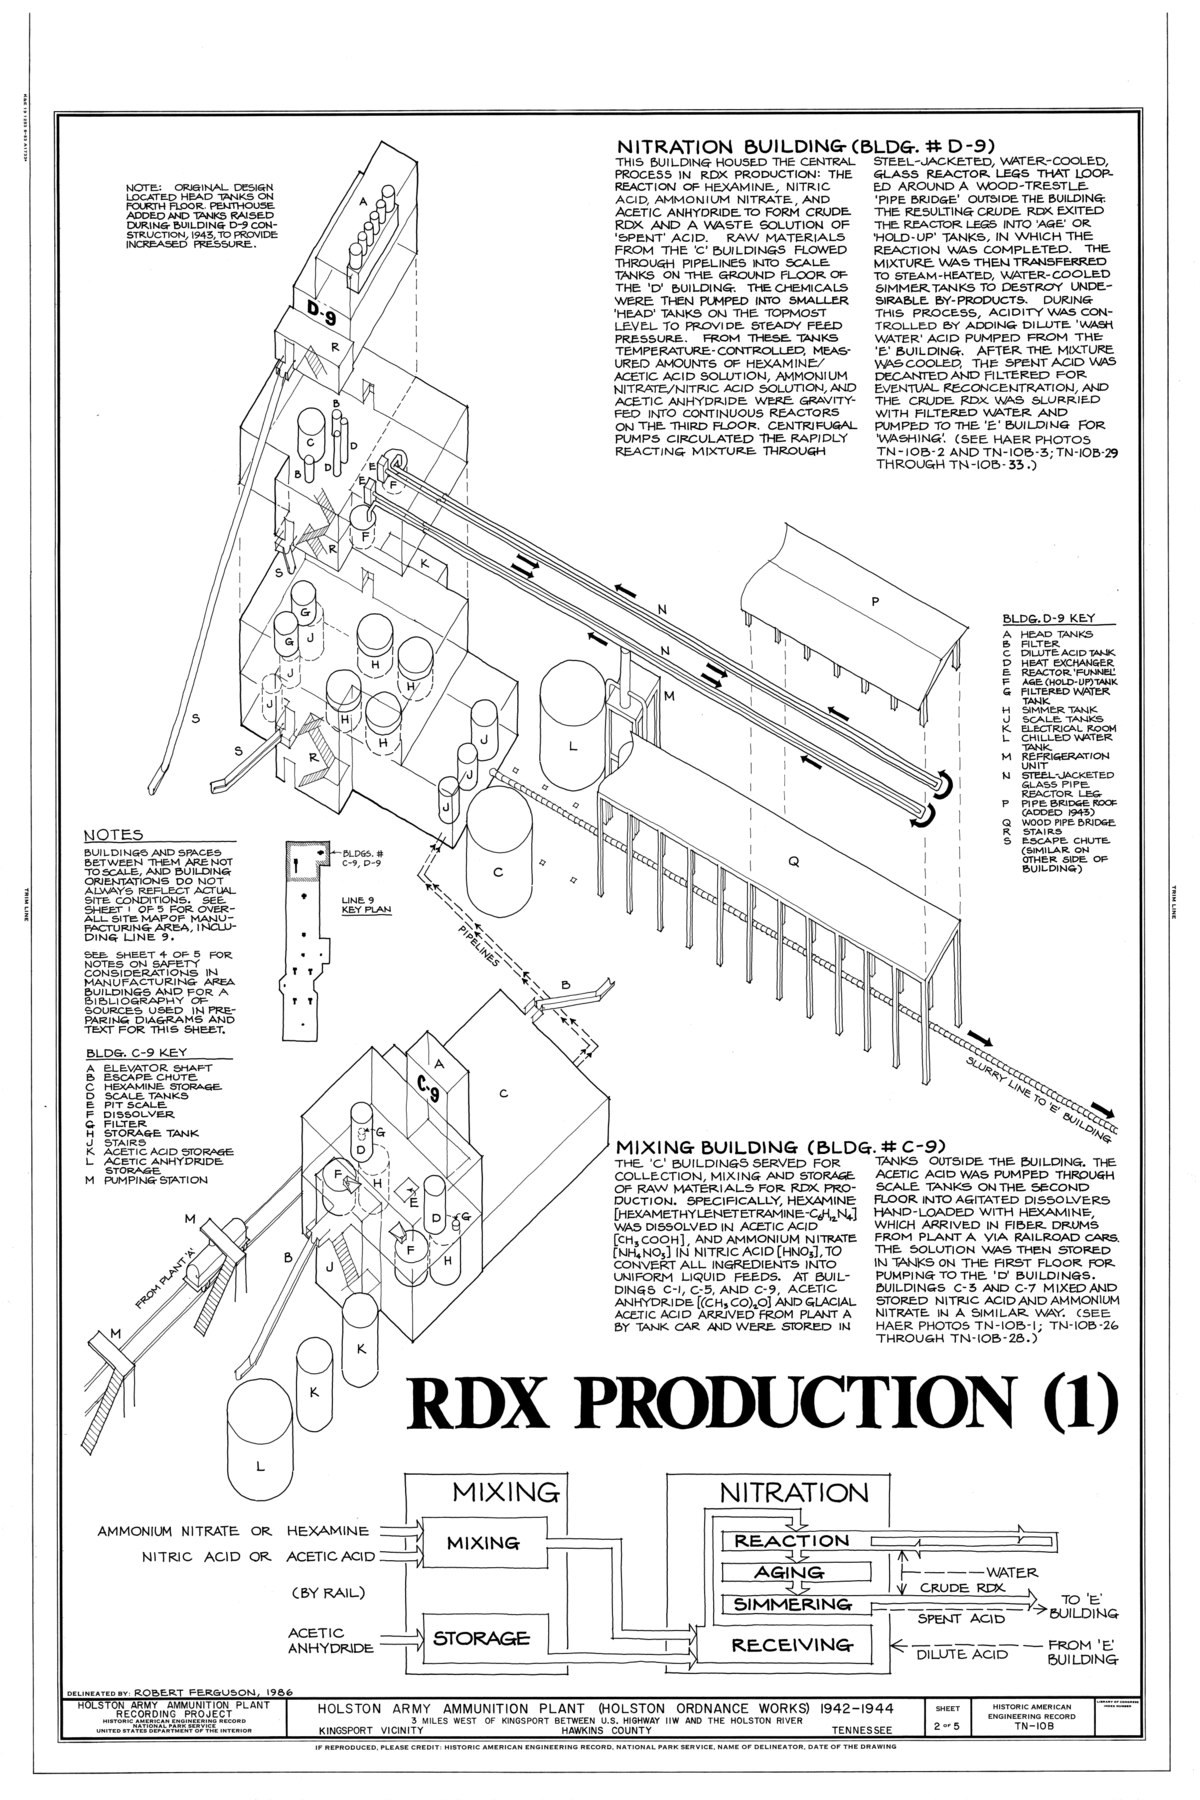 File Rdx Production 1